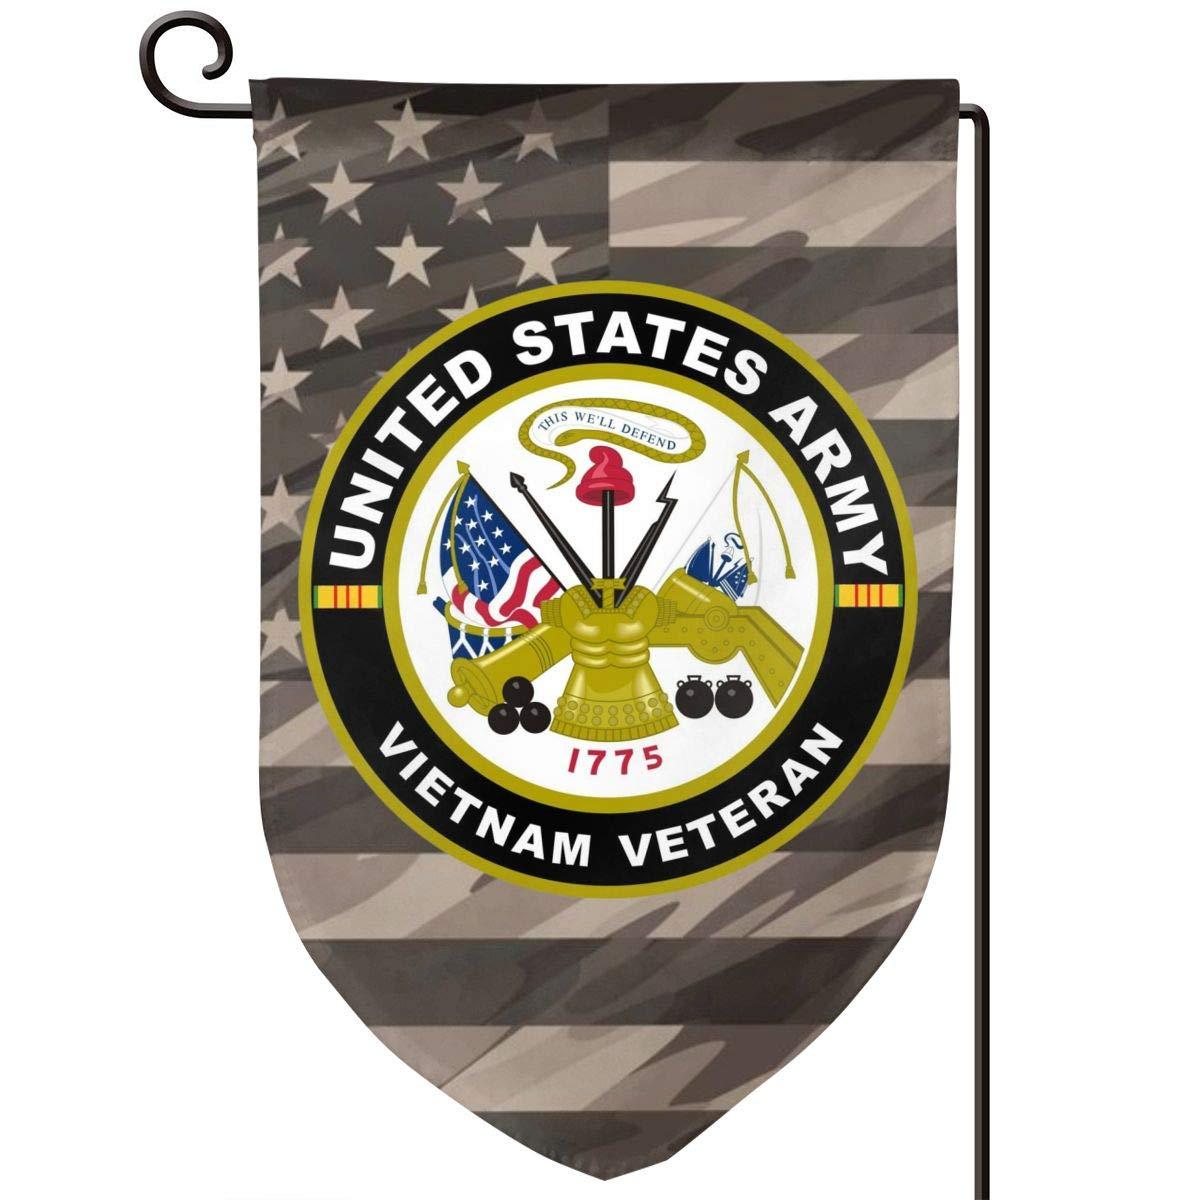 Army Vietnam Veteran Decorative Garden Flag Home Decor Yard Banner 12.5X18 Inch Printed Double Sided Sharp Corner